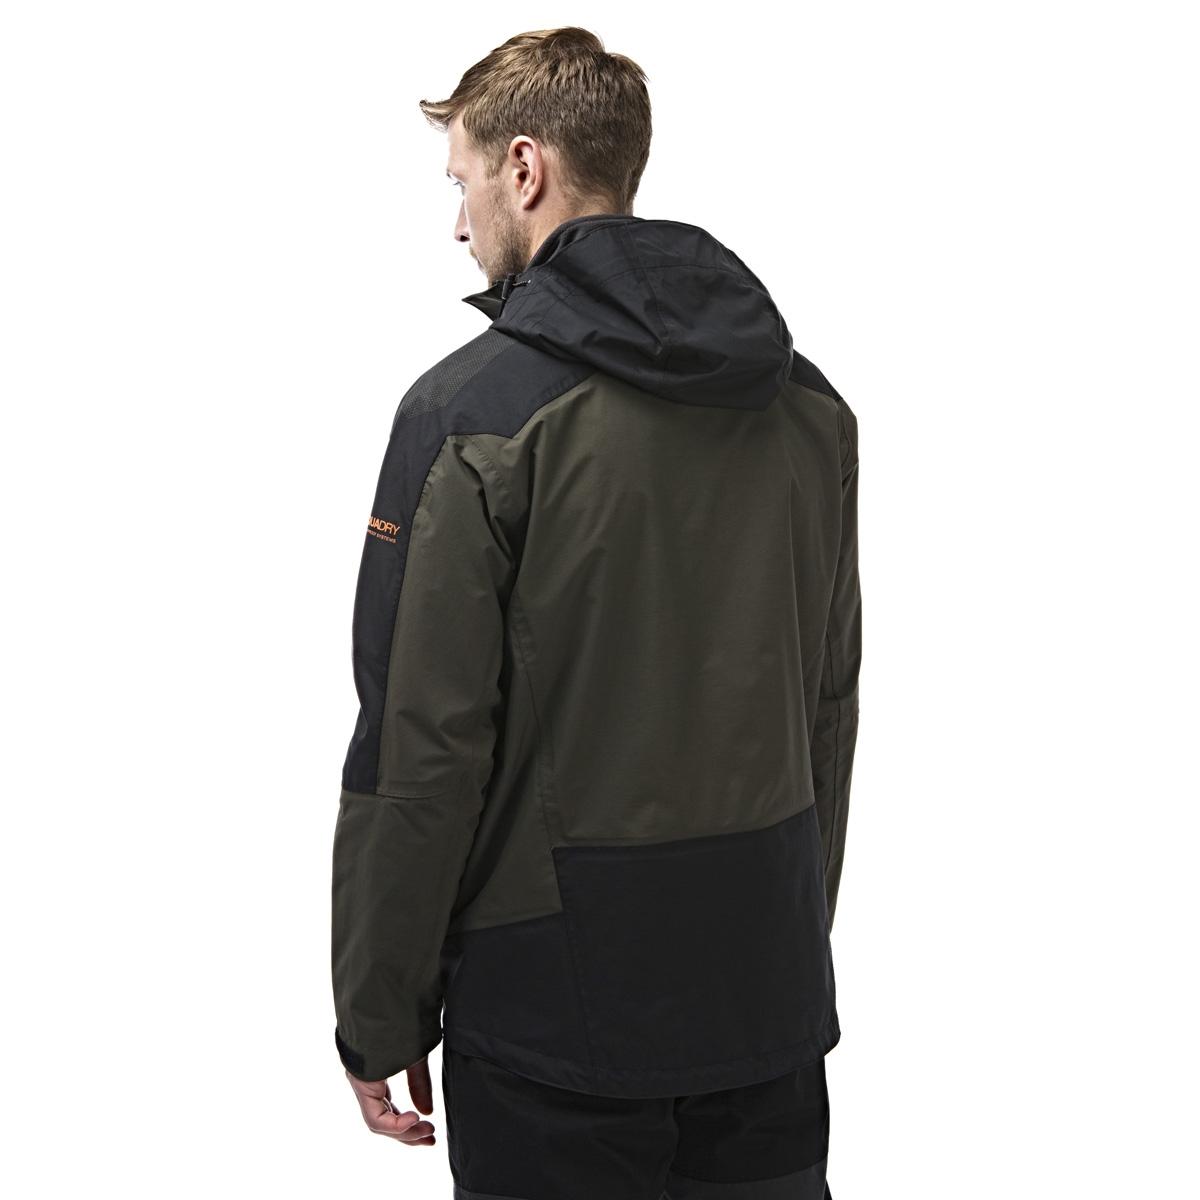 Bear Grylls Rain Jacket | Bear Grylls Clothing | Bear Grylls Store Uk